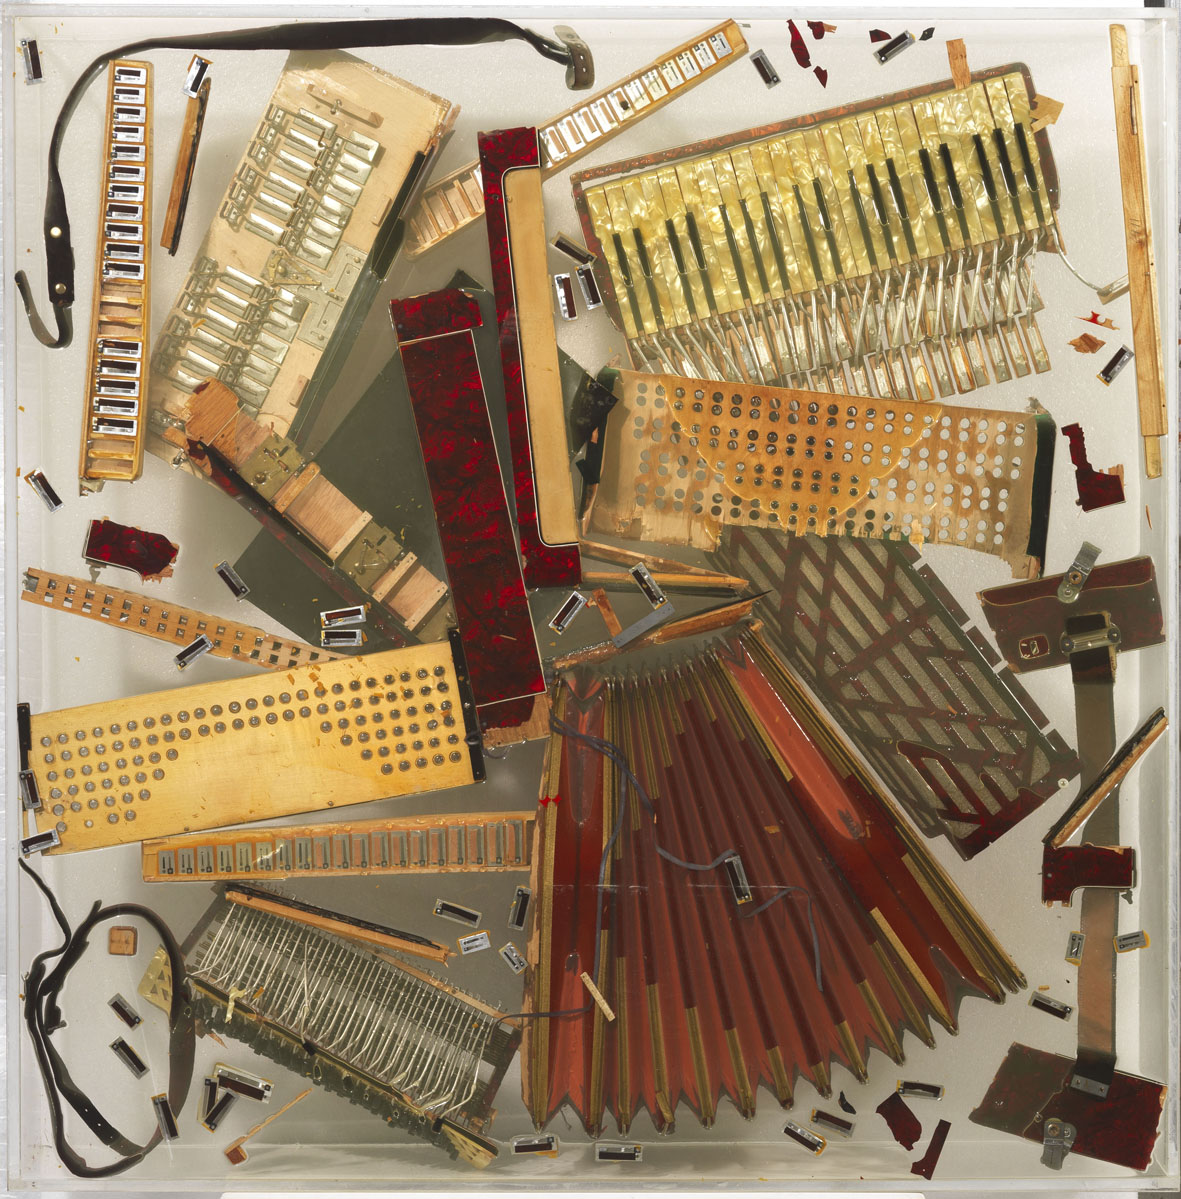 Arman, Sans titre, 1971 ca, fisarmonica frammentata nel plexiglas, cm 120x120x20